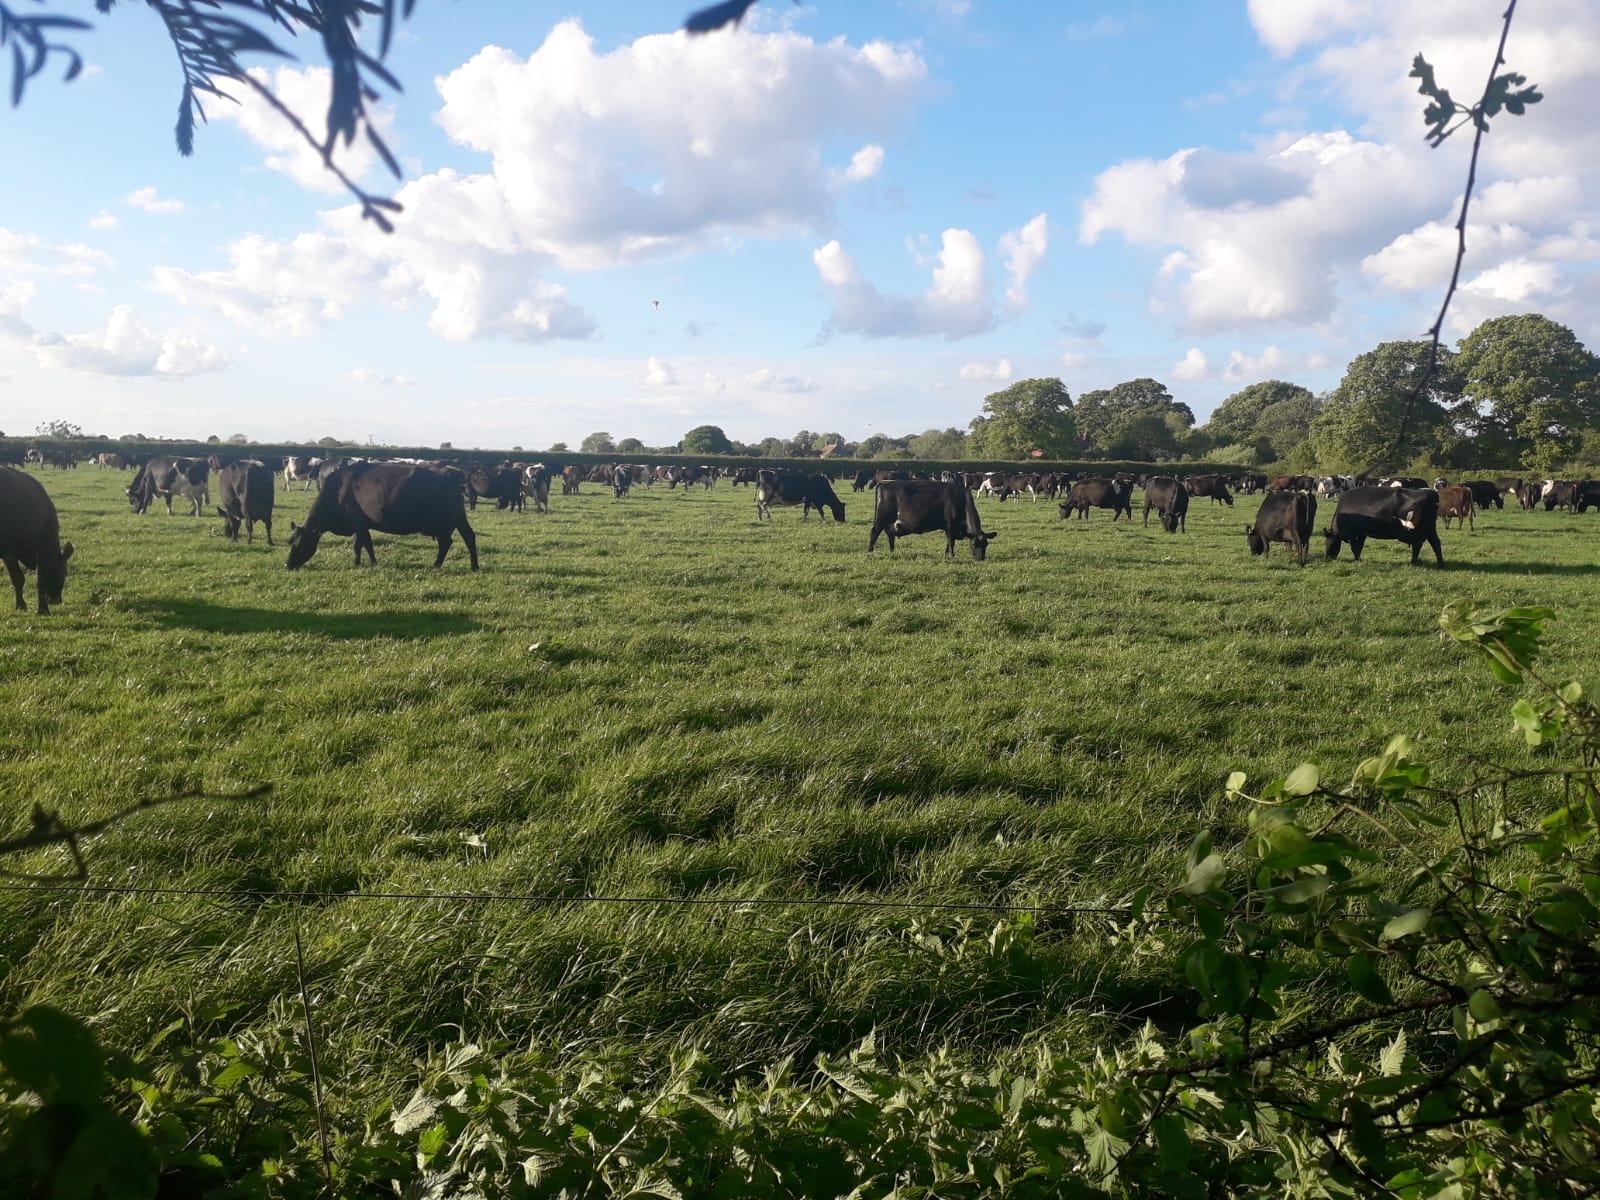 a herd of horses grazing in a field